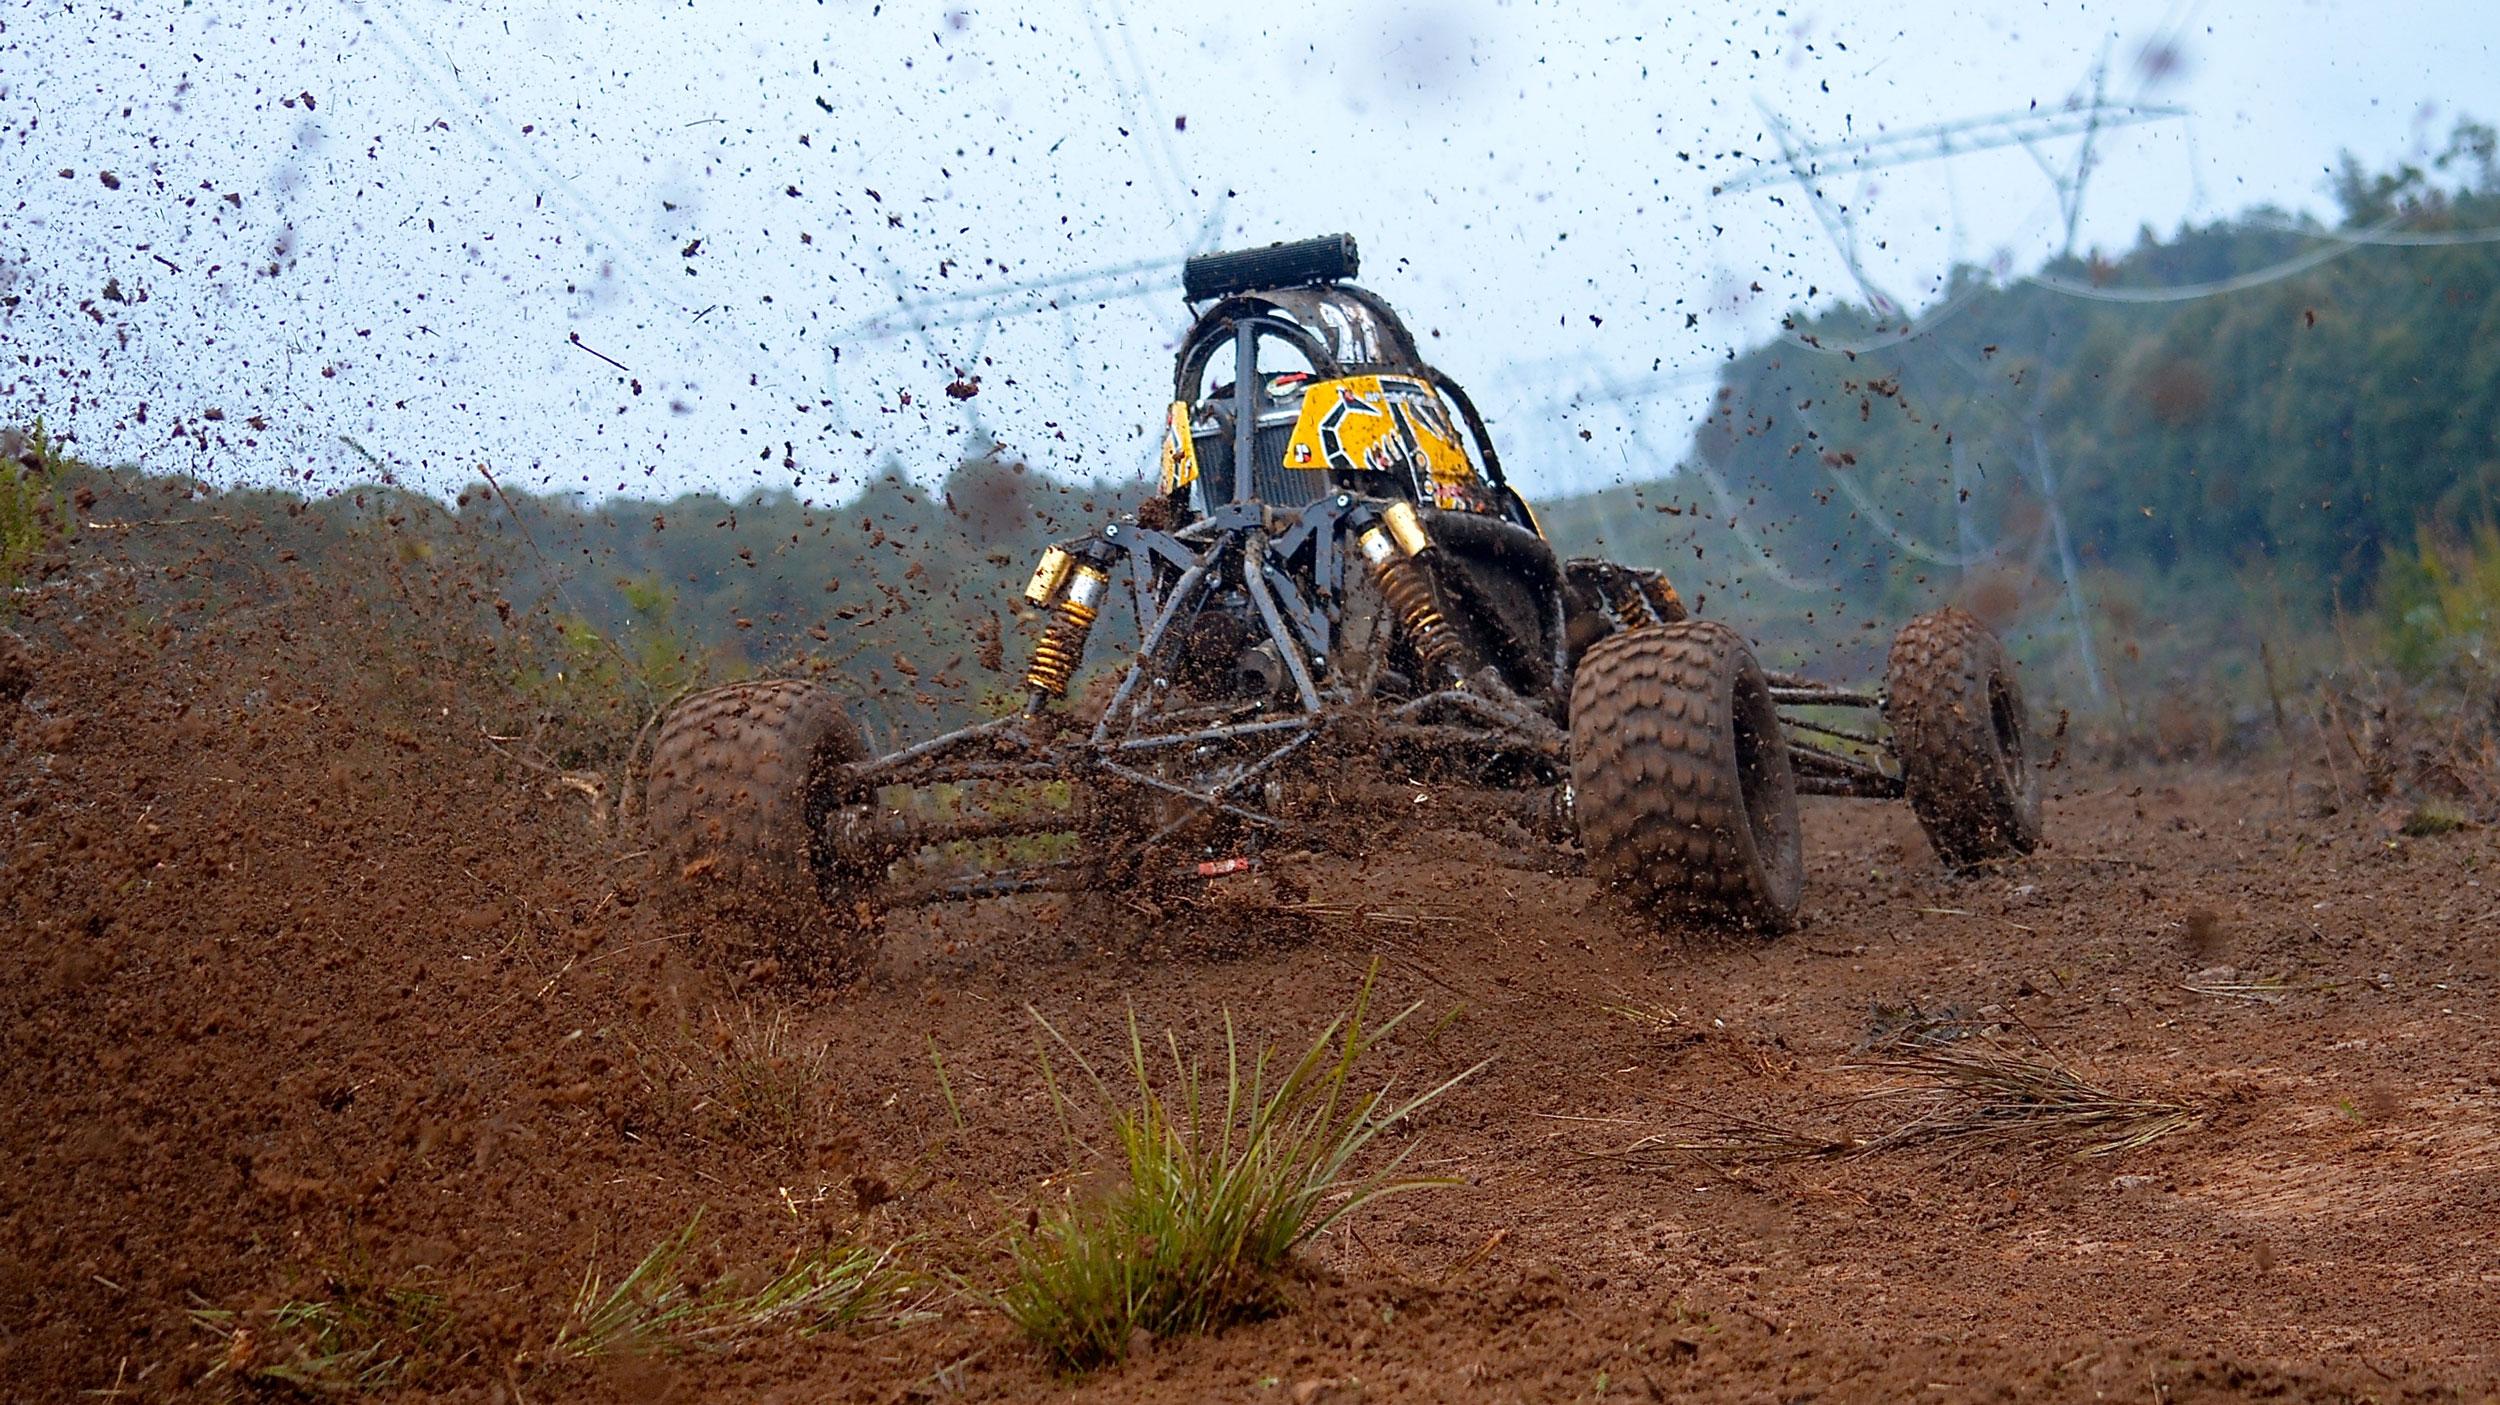 Buggy-Mud5-2500